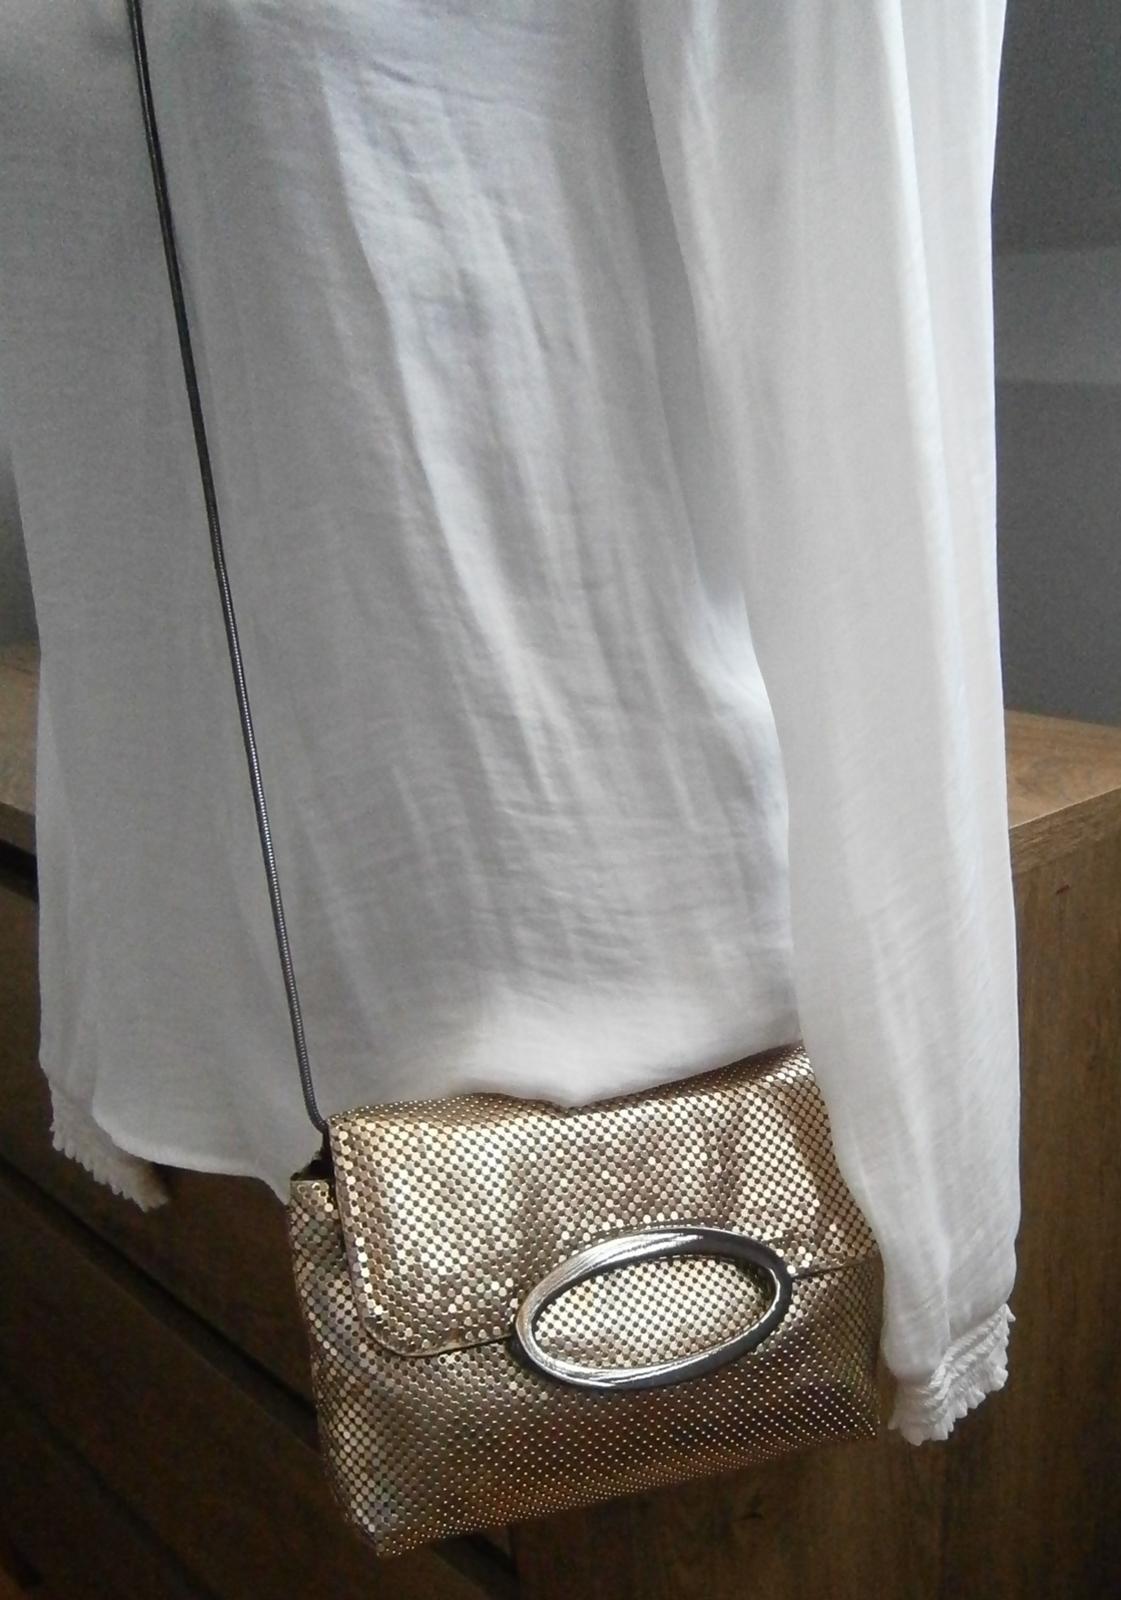 Dámska spoloč. kabelka- Reserved - Obrázok č. 1